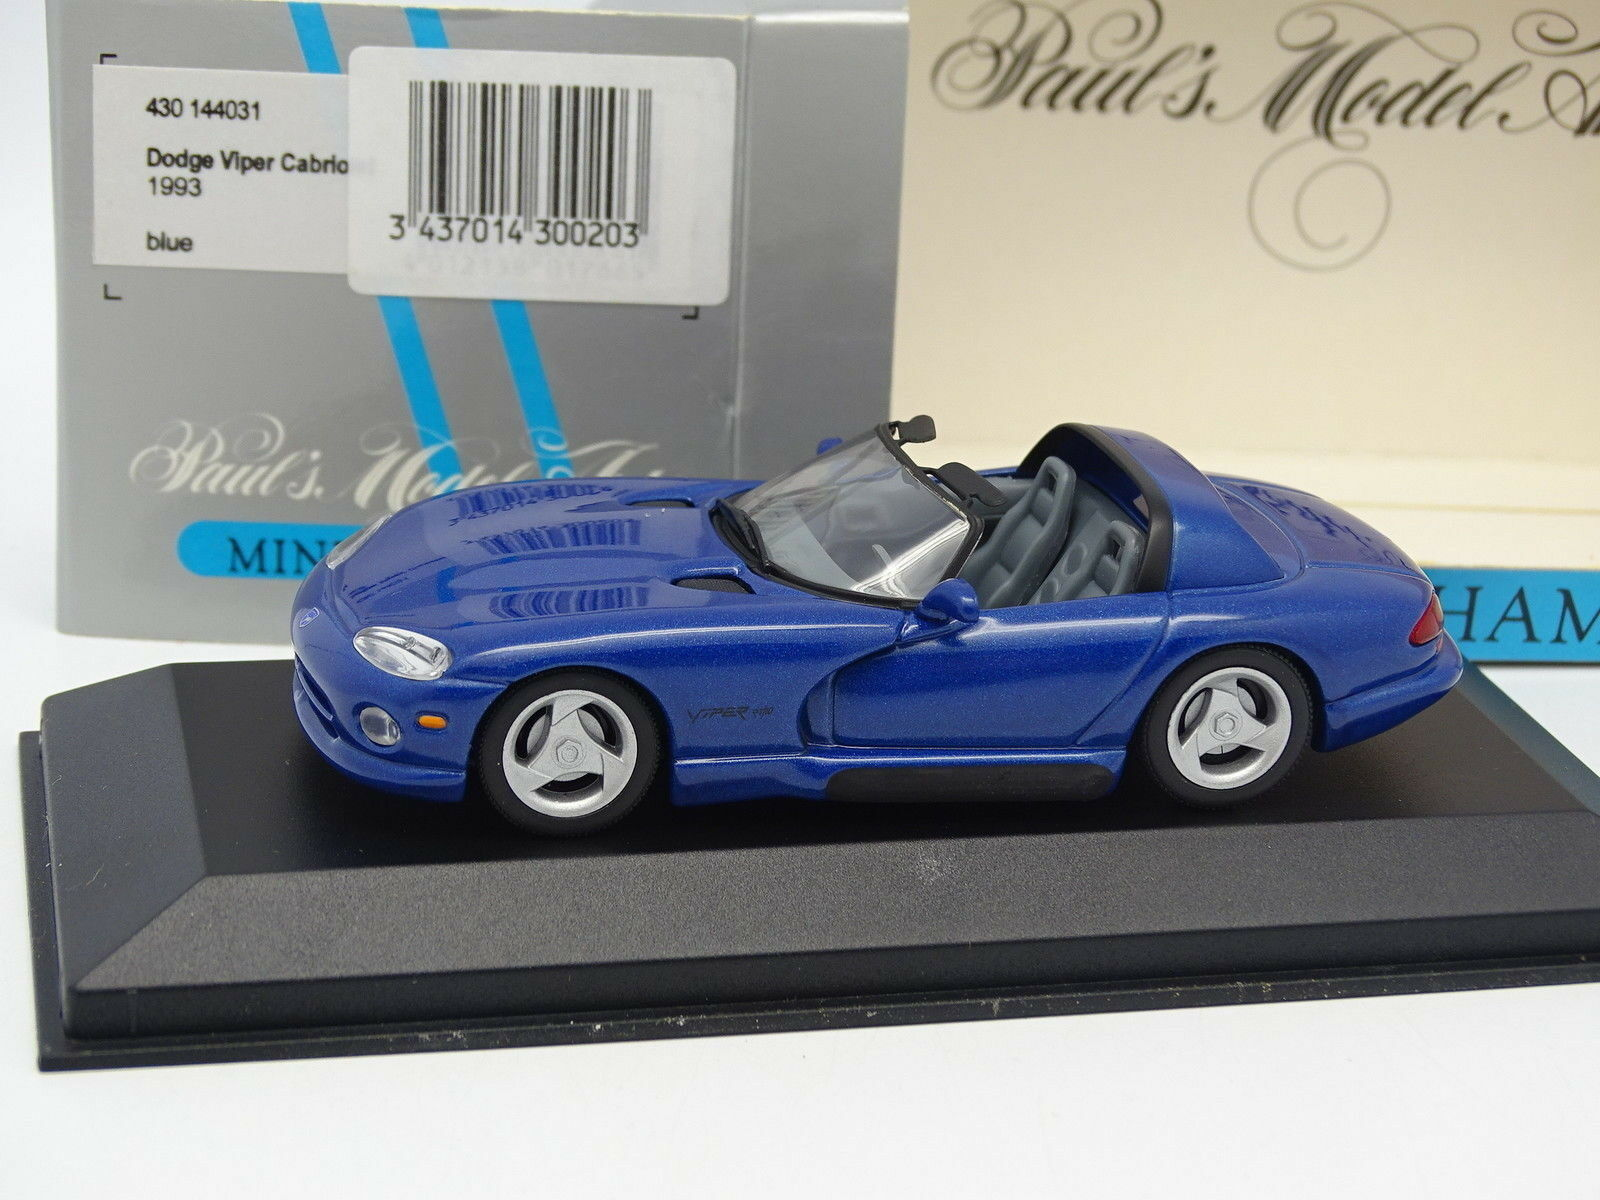 Minichamps 1 43 - Dodge Viper Cabriolet Bleue 1993